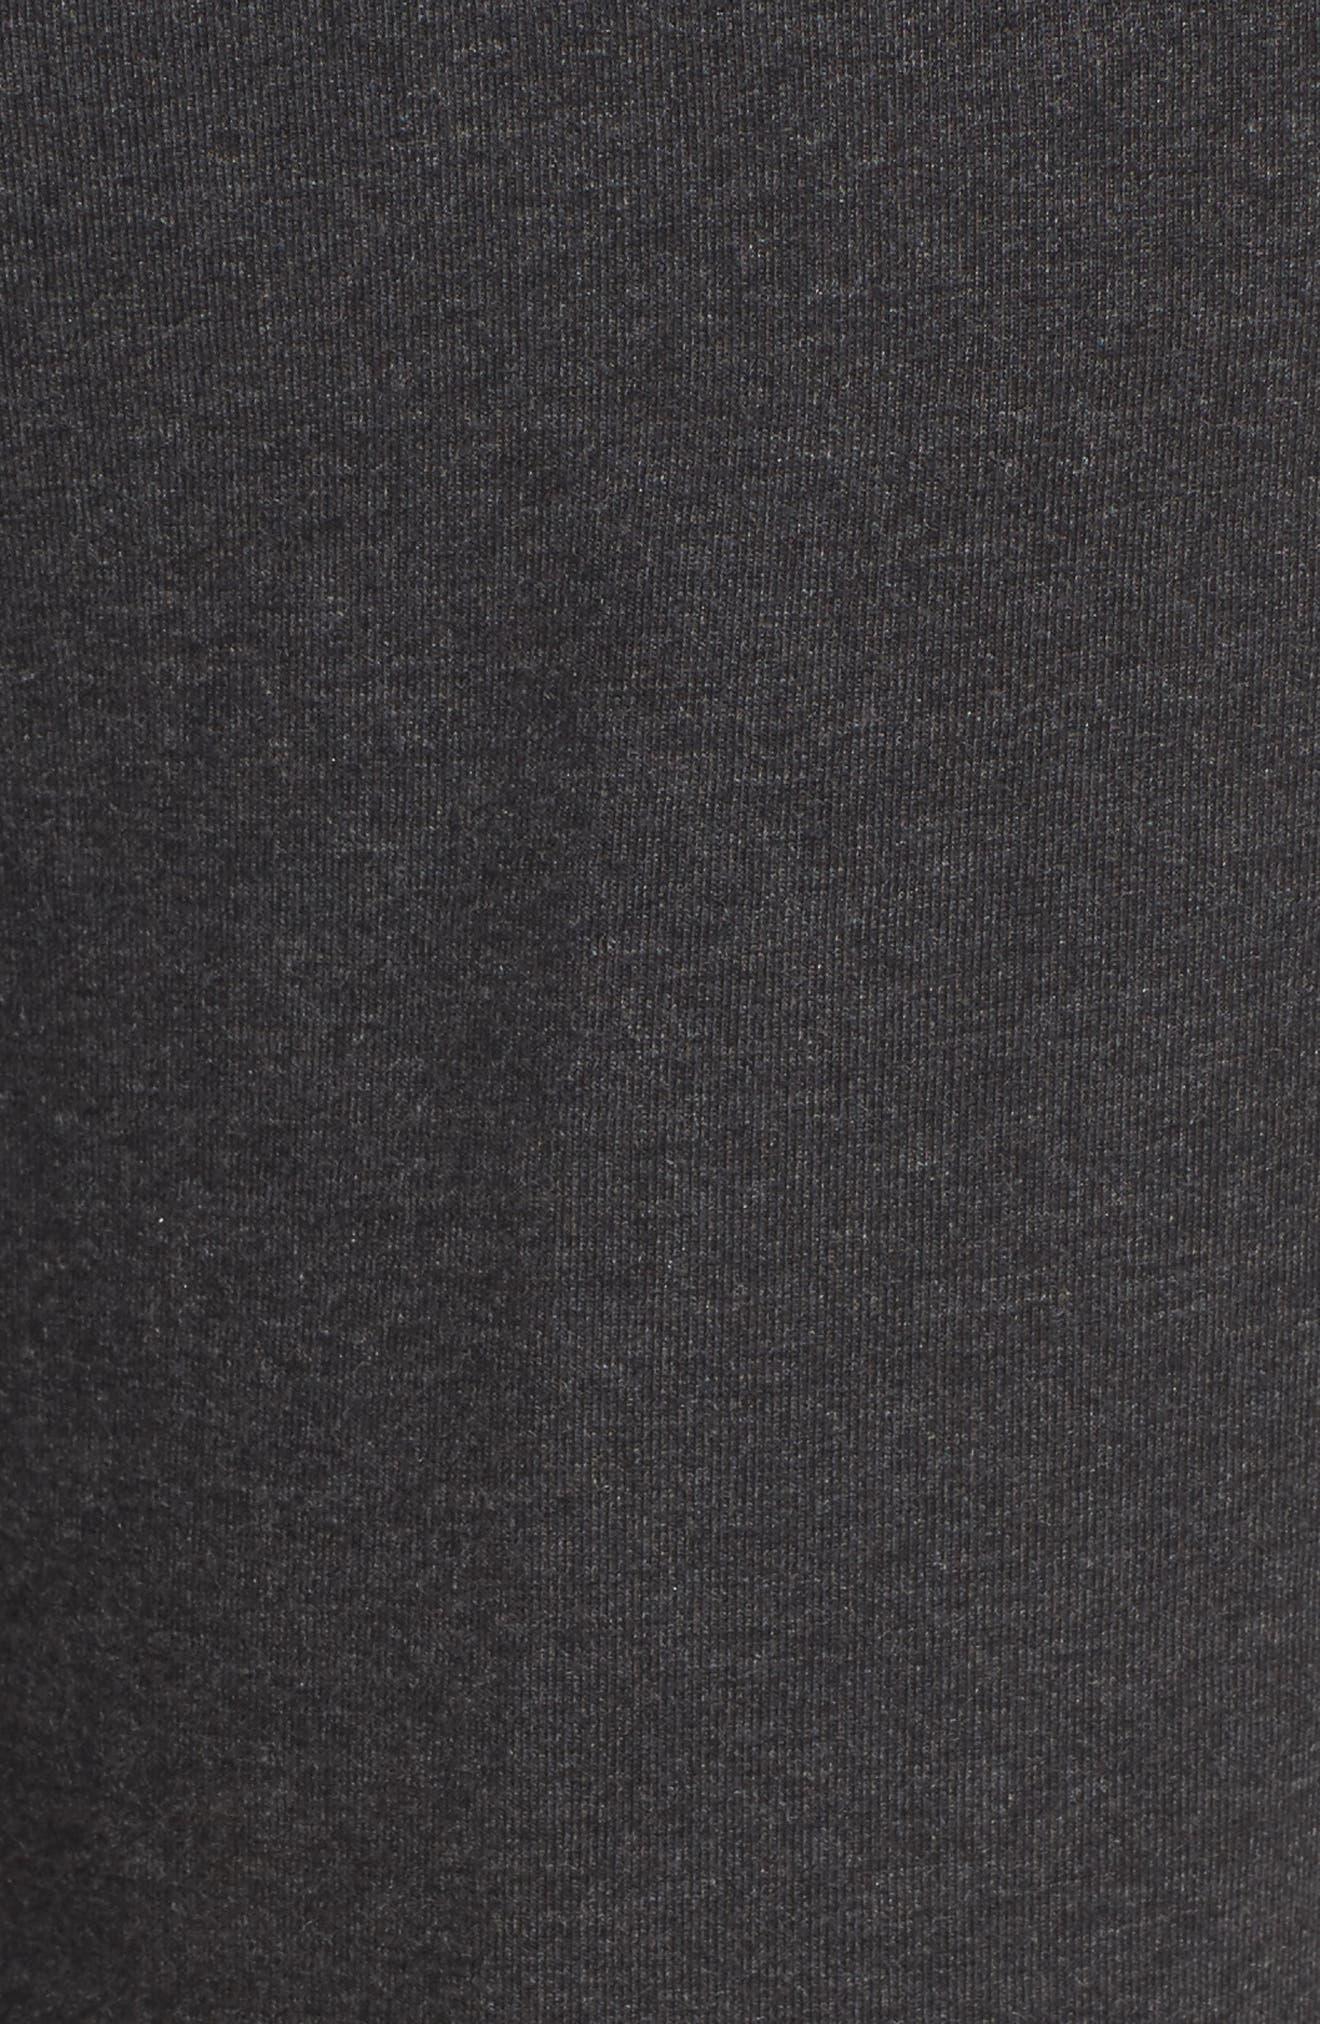 Slouchy Knit Pants,                             Alternate thumbnail 5, color,                             021